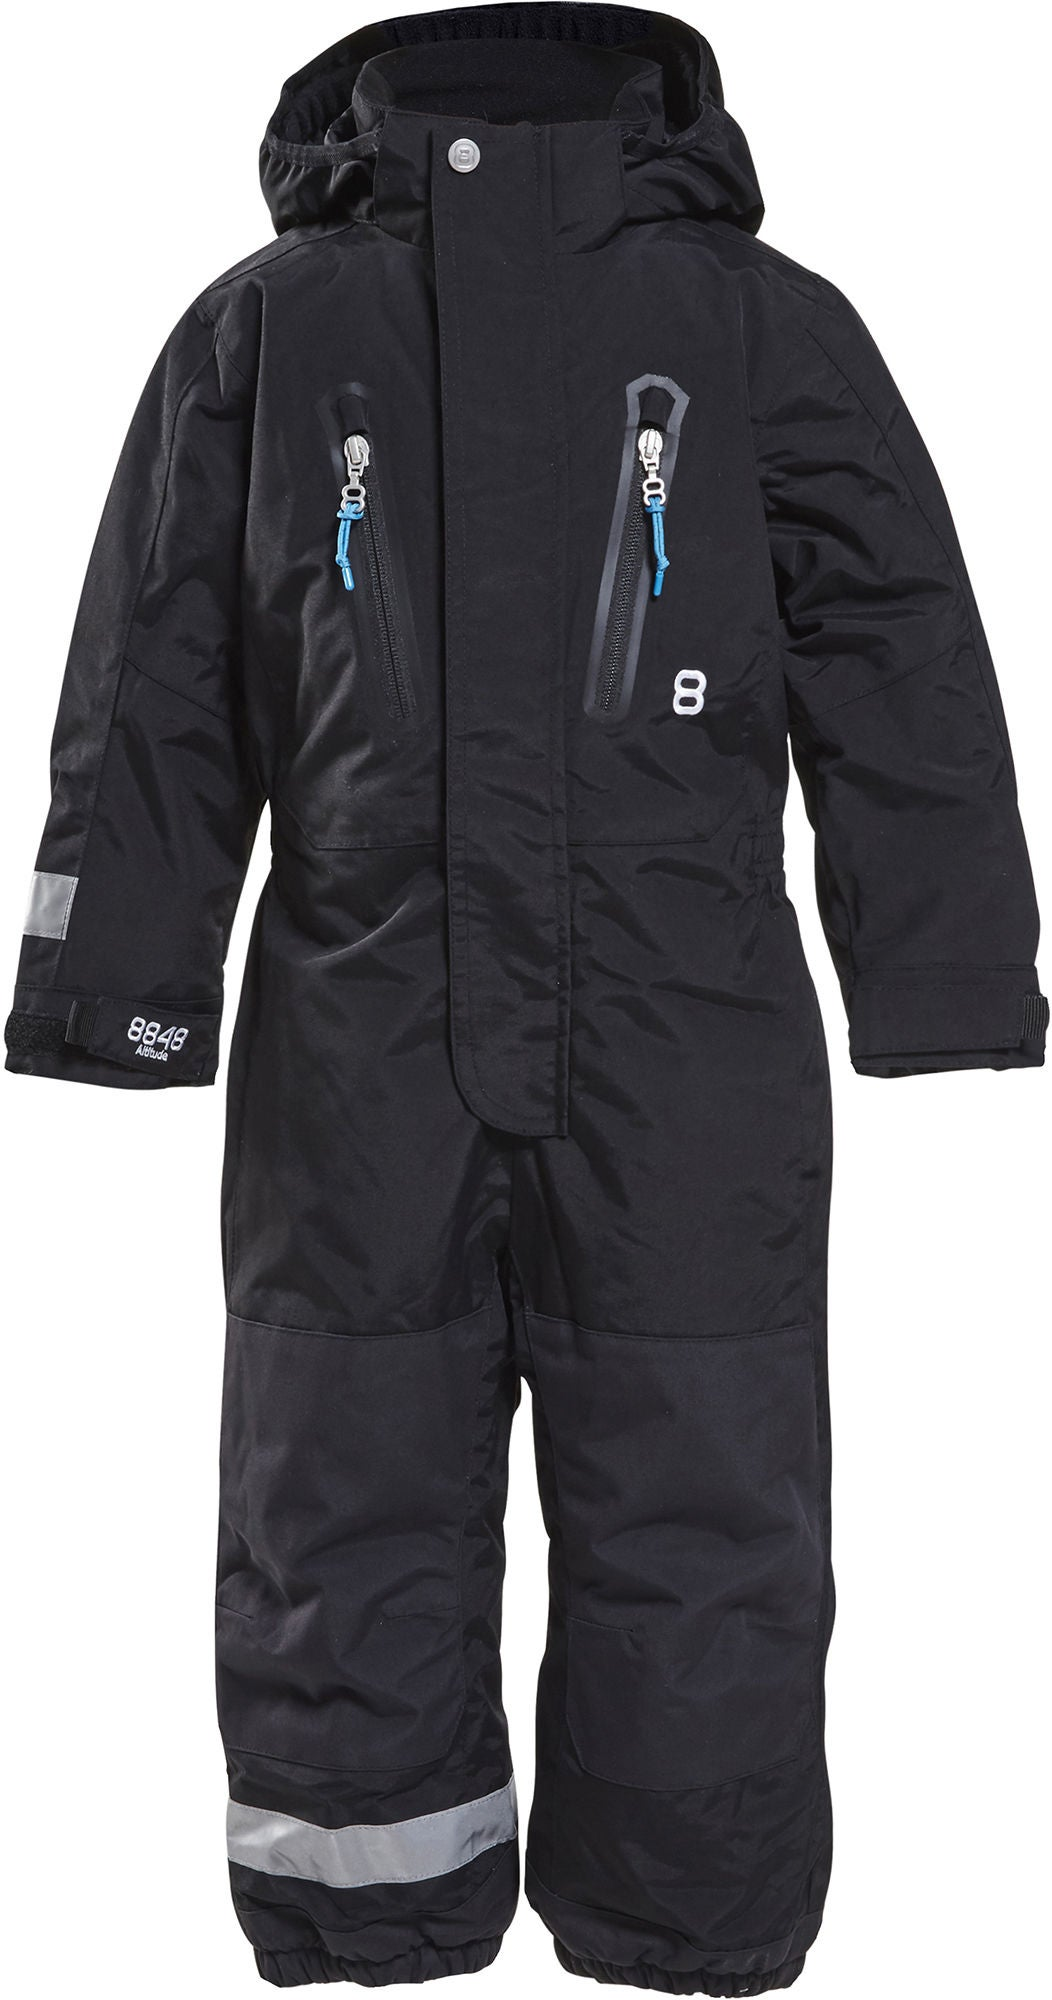 8848 Altitude Karel Min Overall, Black 80